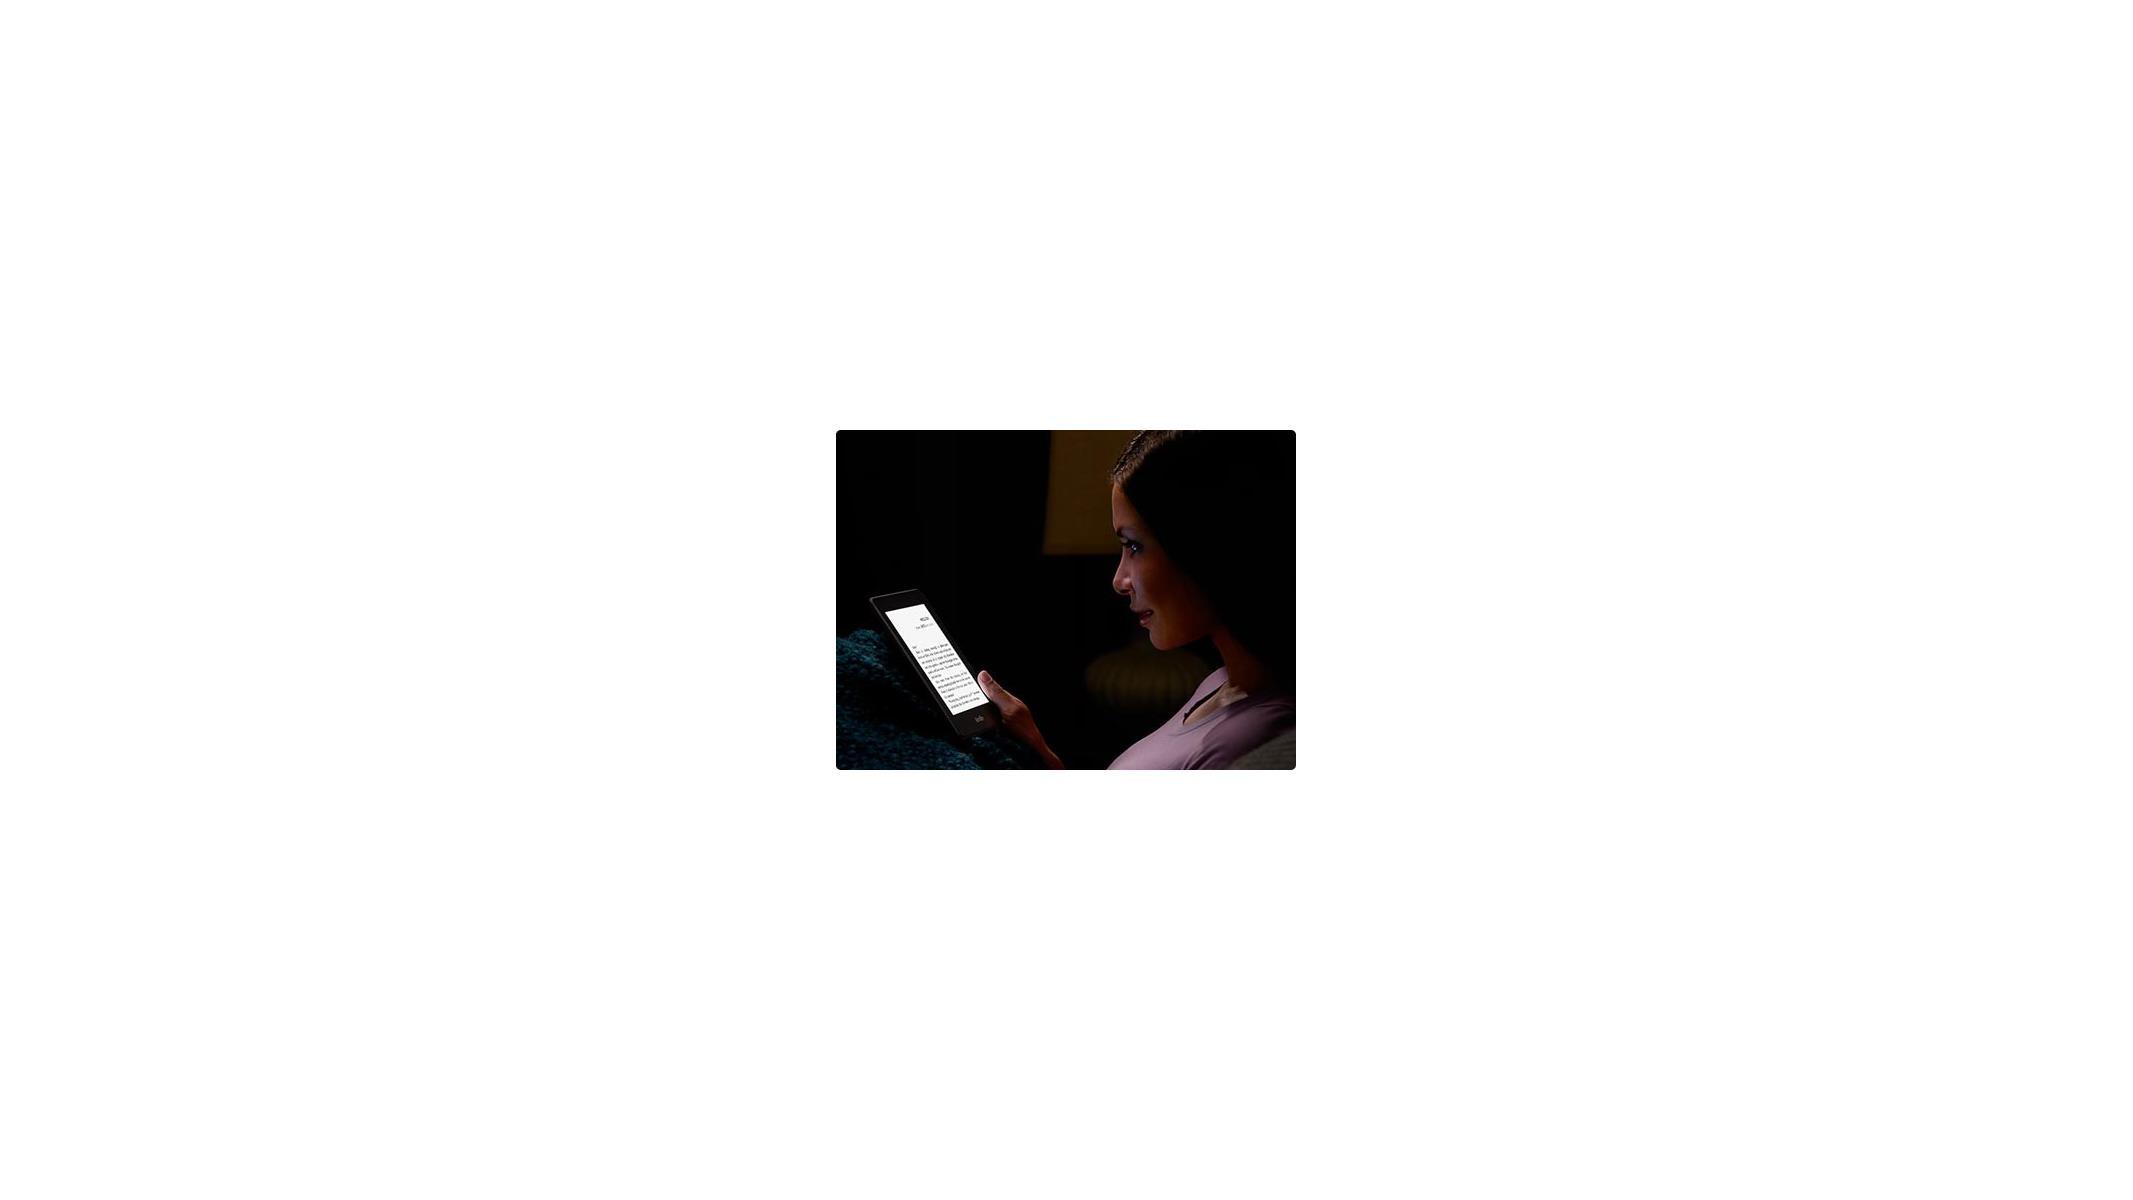 Amazon Kindle Paper White Kindle Jailbroken | HotHardware